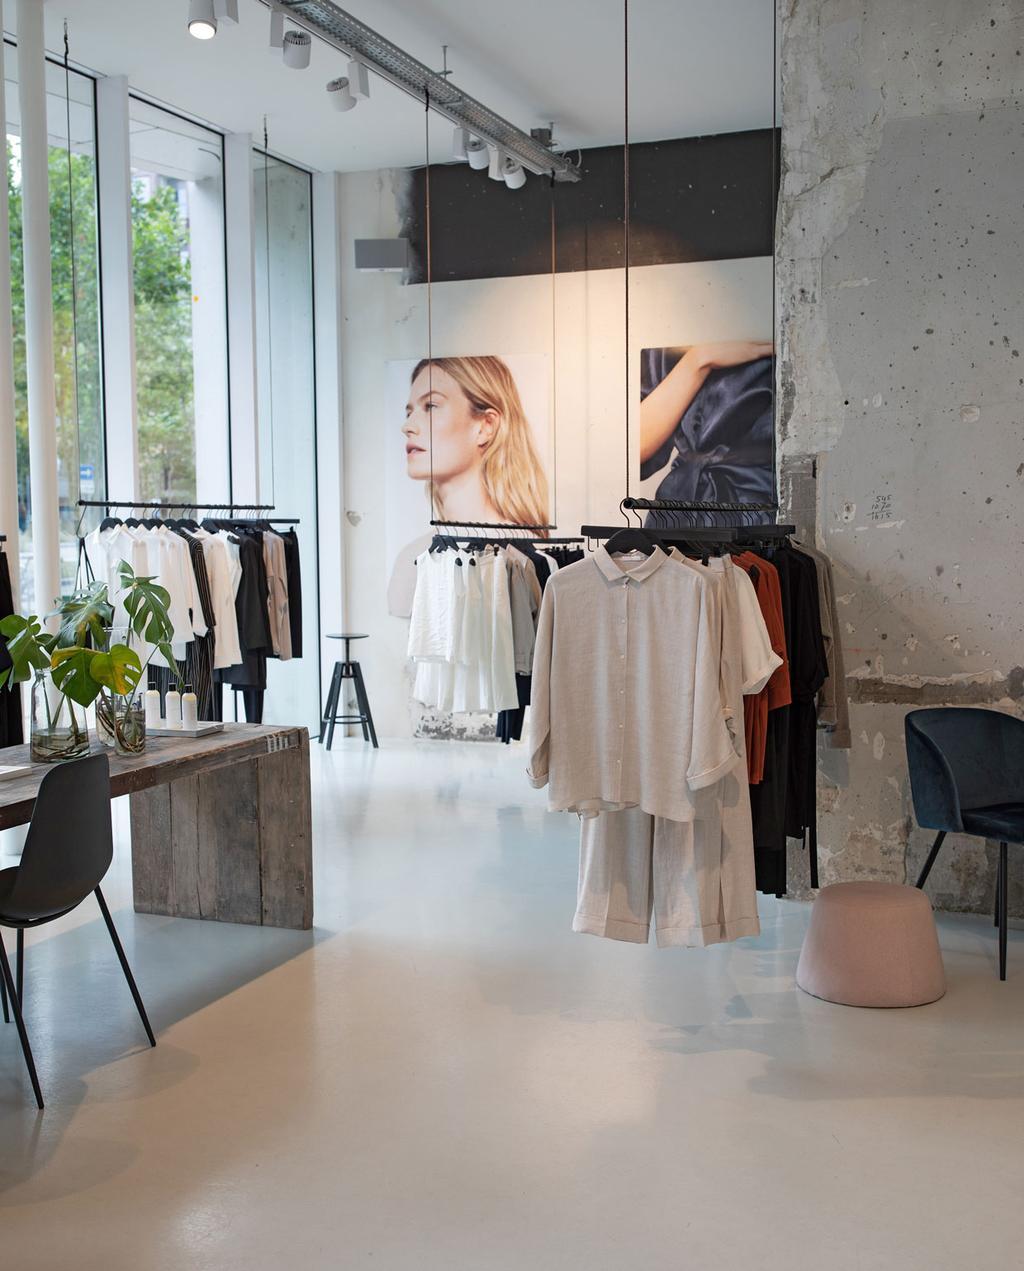 vtwonen 10-2019 | Citytrip Eindhoven Studio Ruig